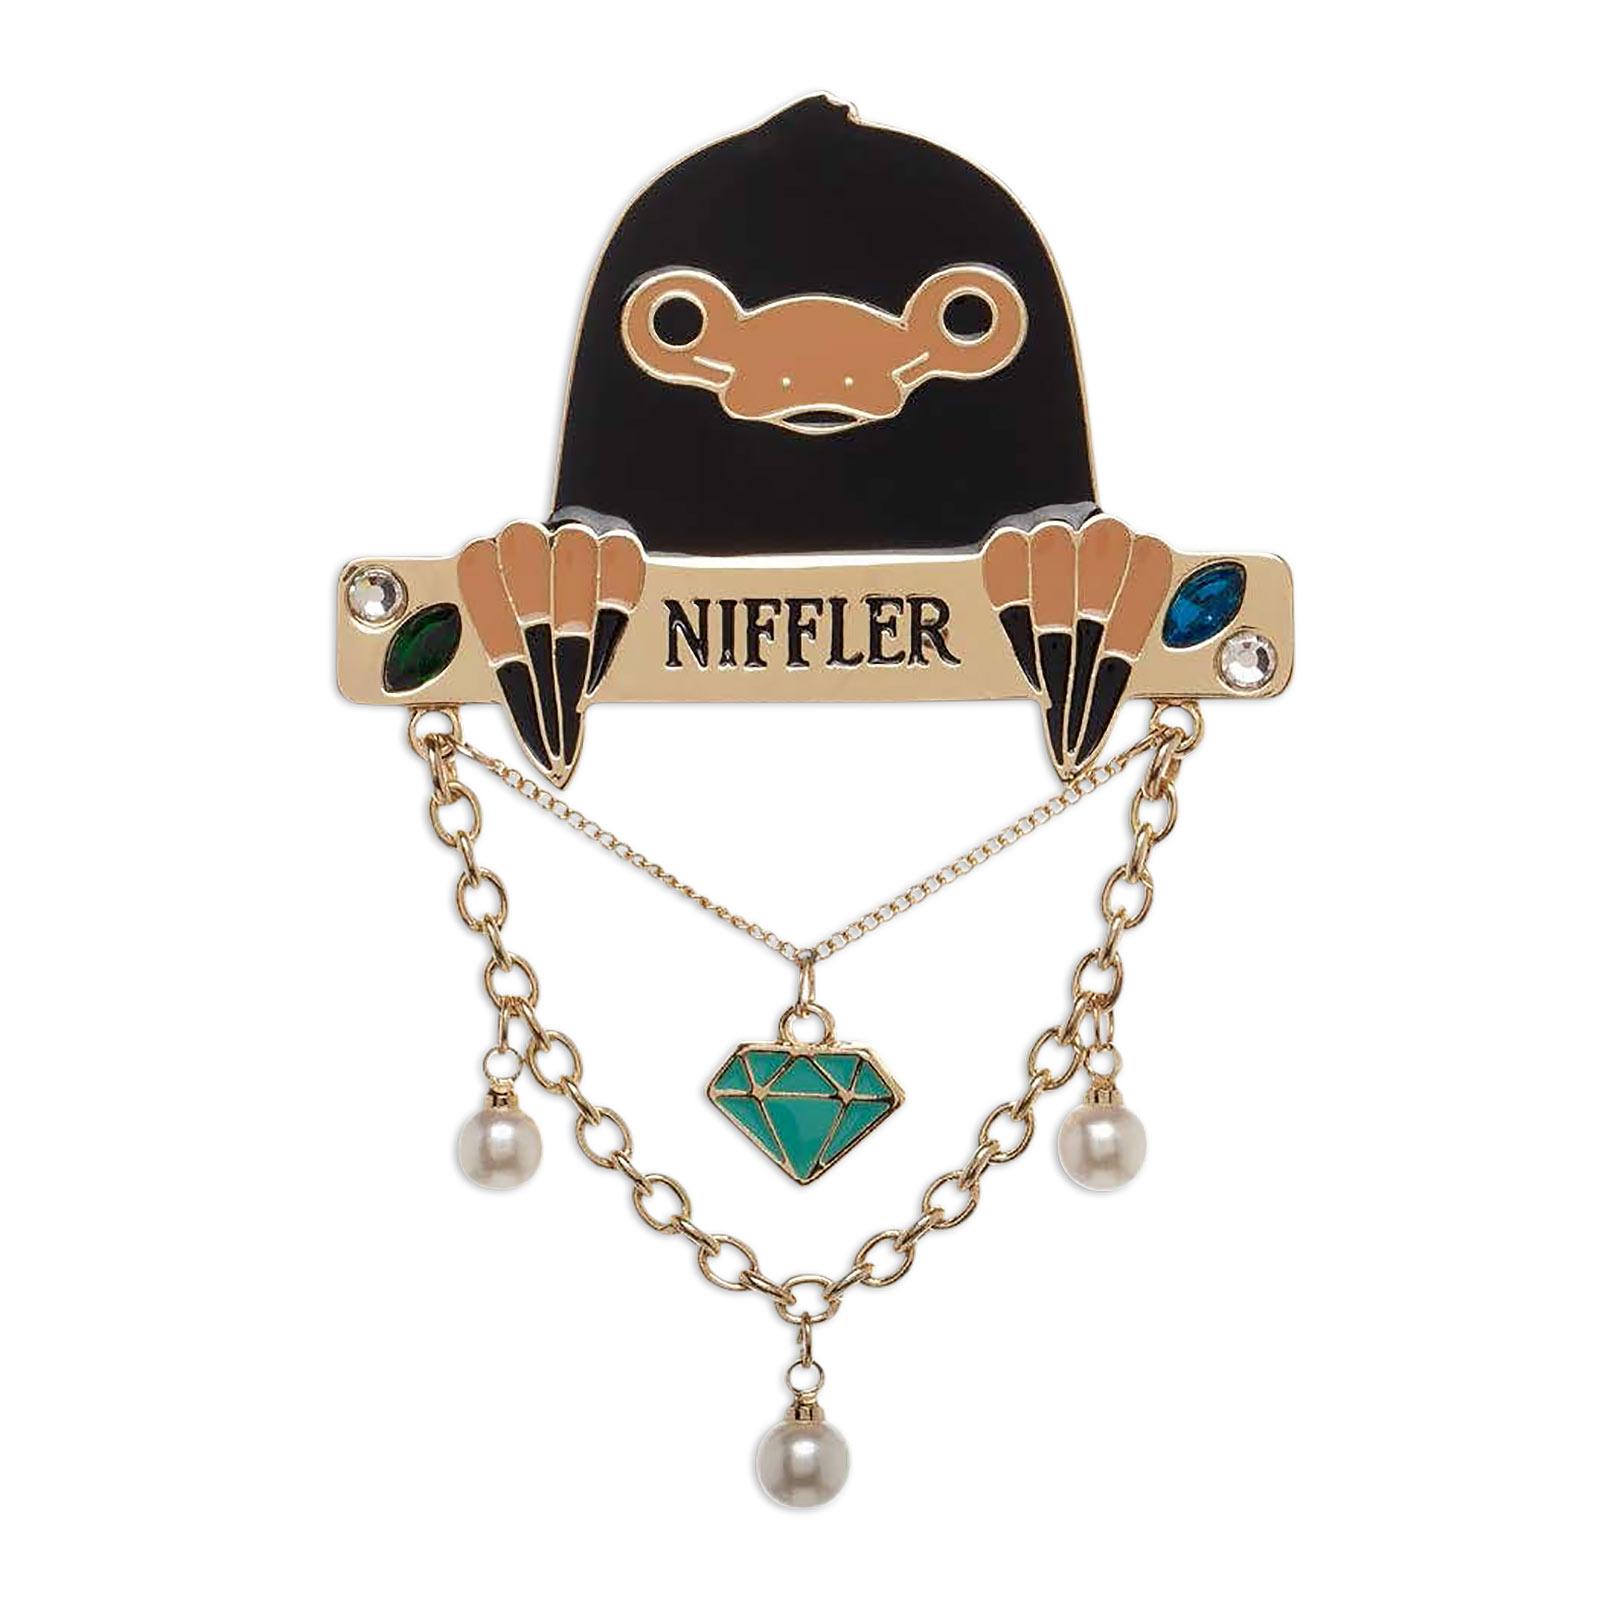 Niffler Brosche - Phantastische Tierwesen